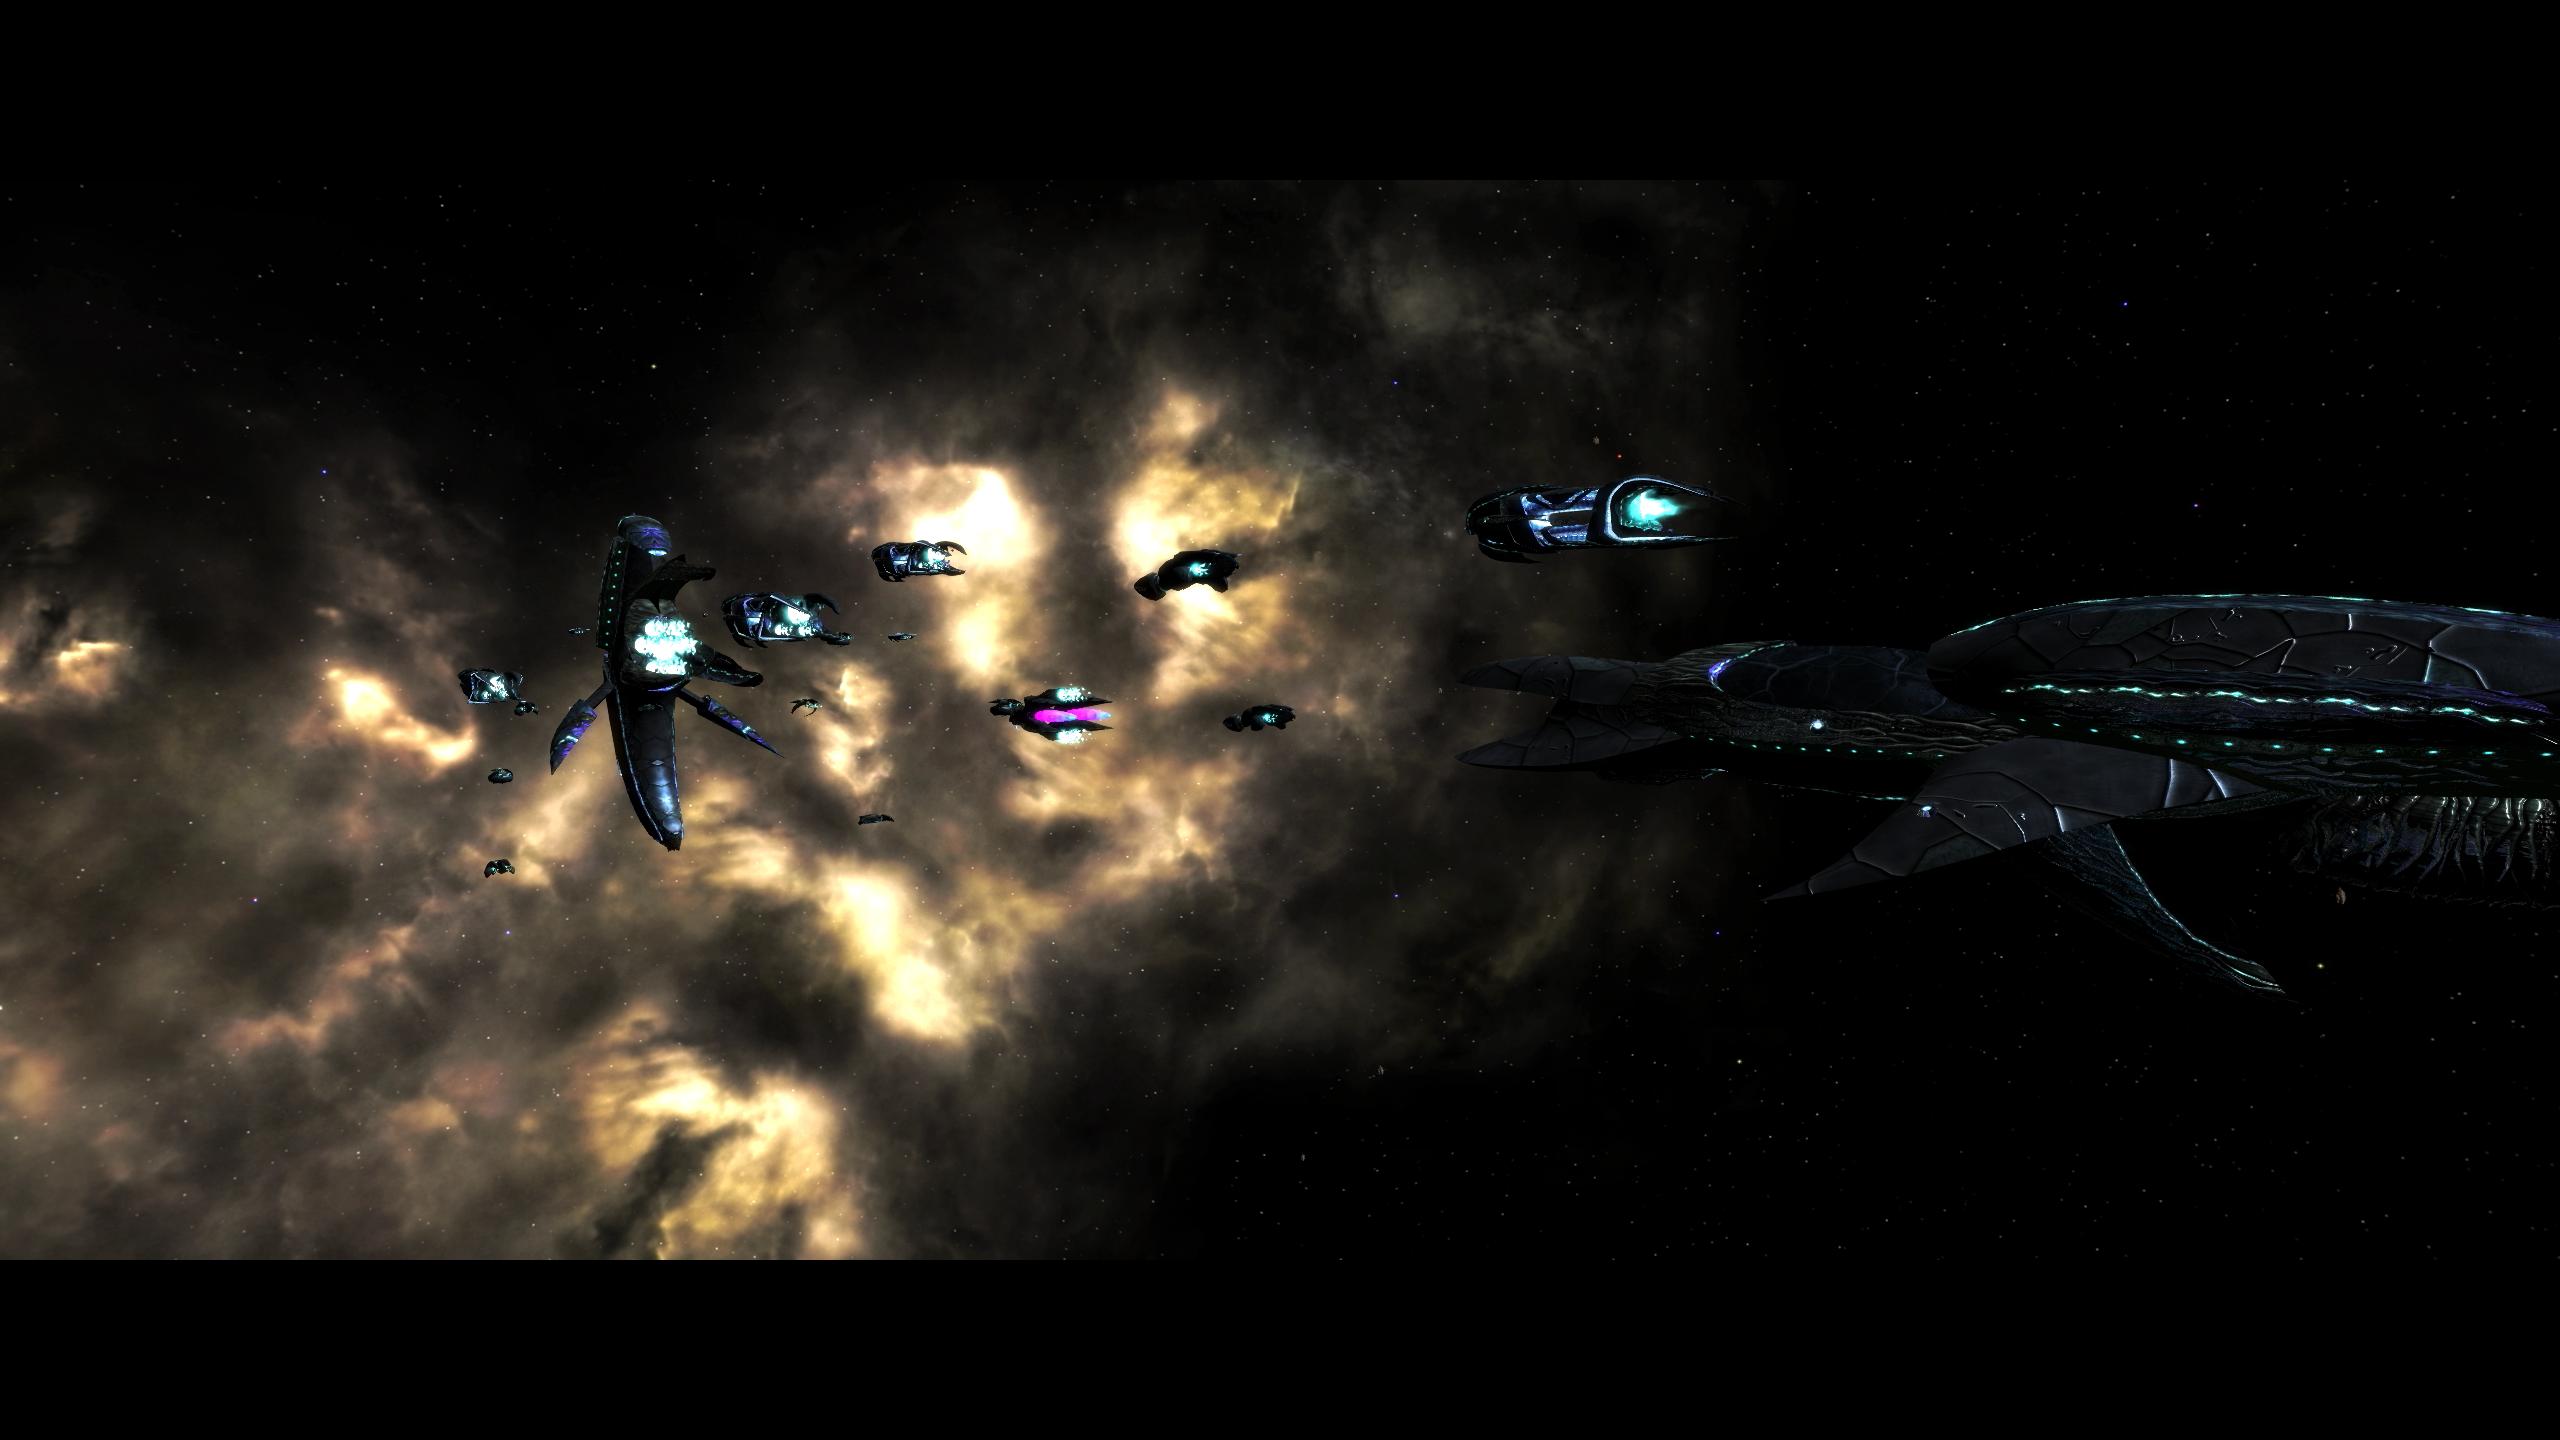 The Ancient fleet